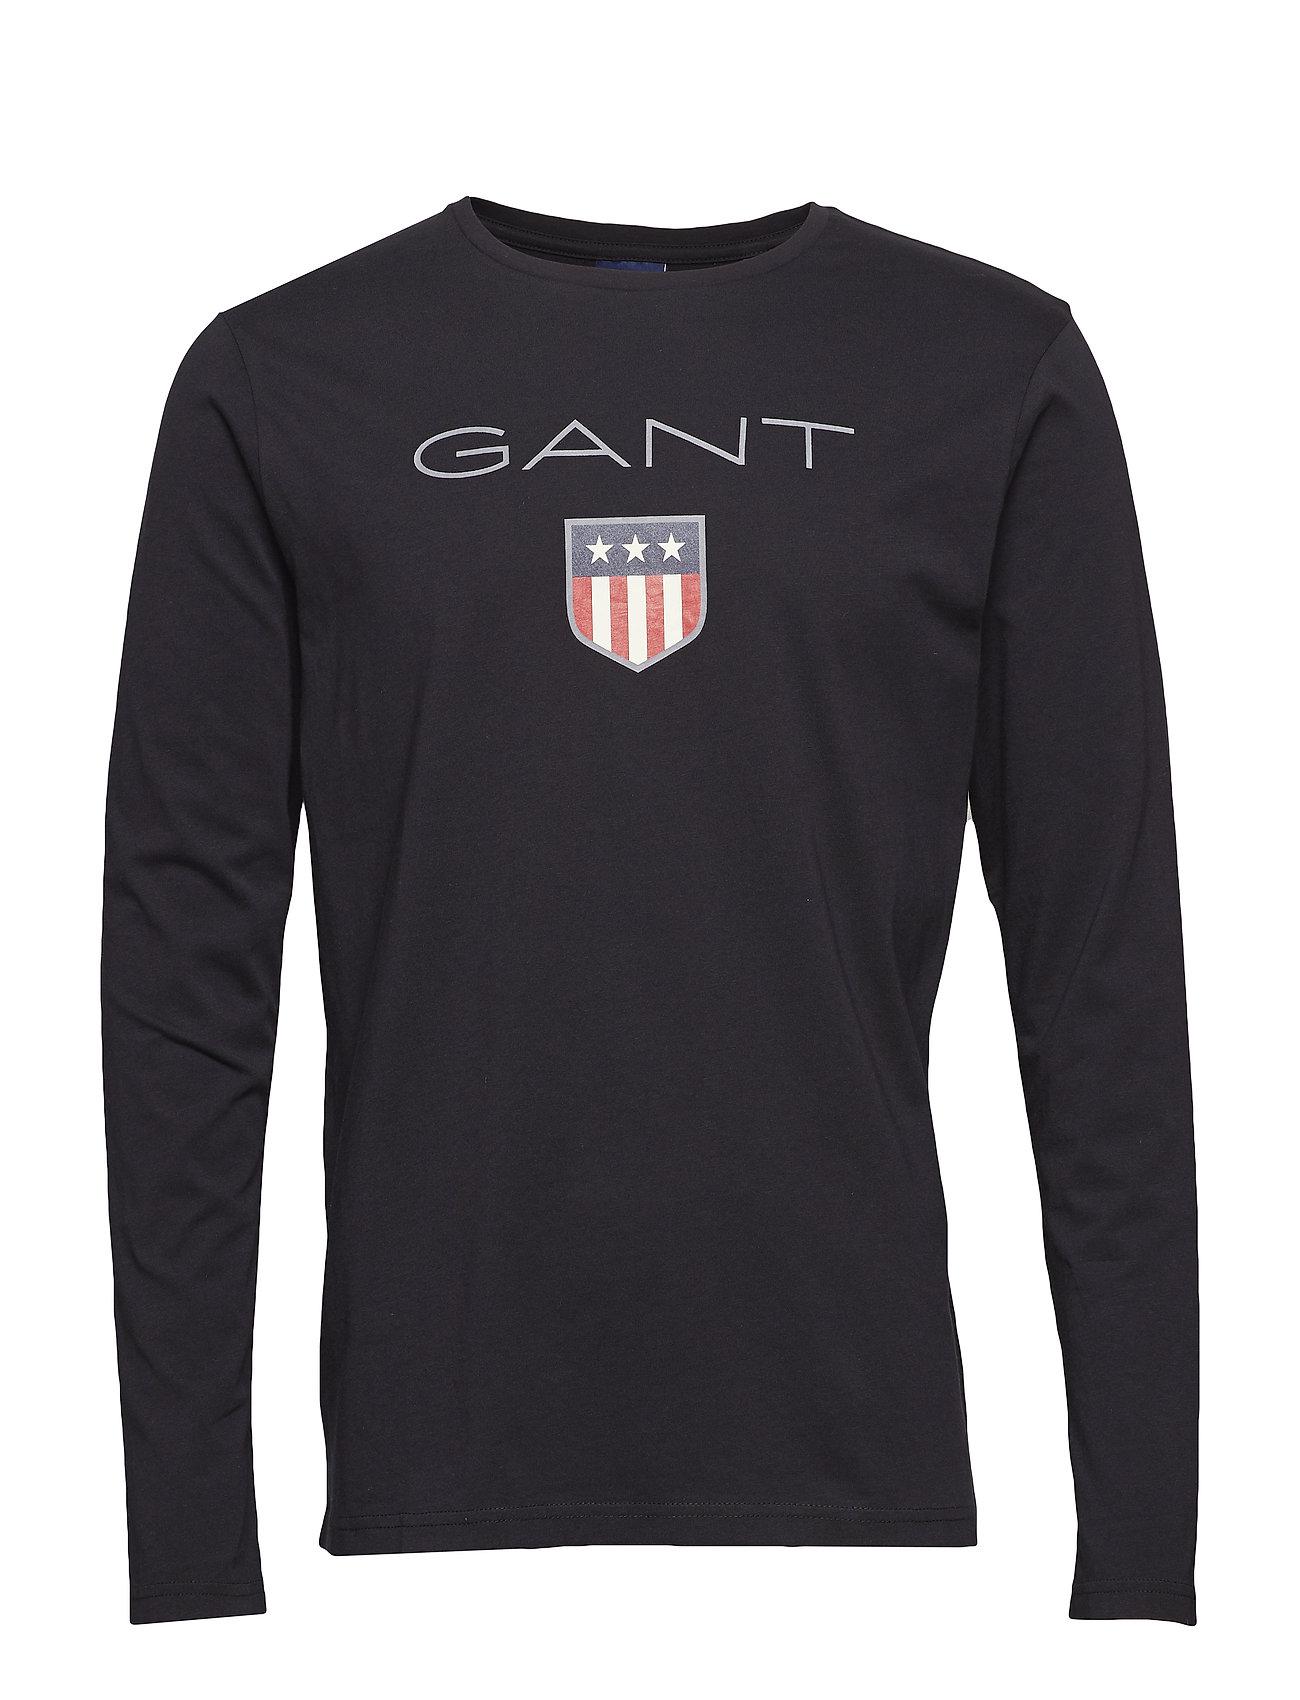 GANT SHIELD LS T-SHIRT - BLACK